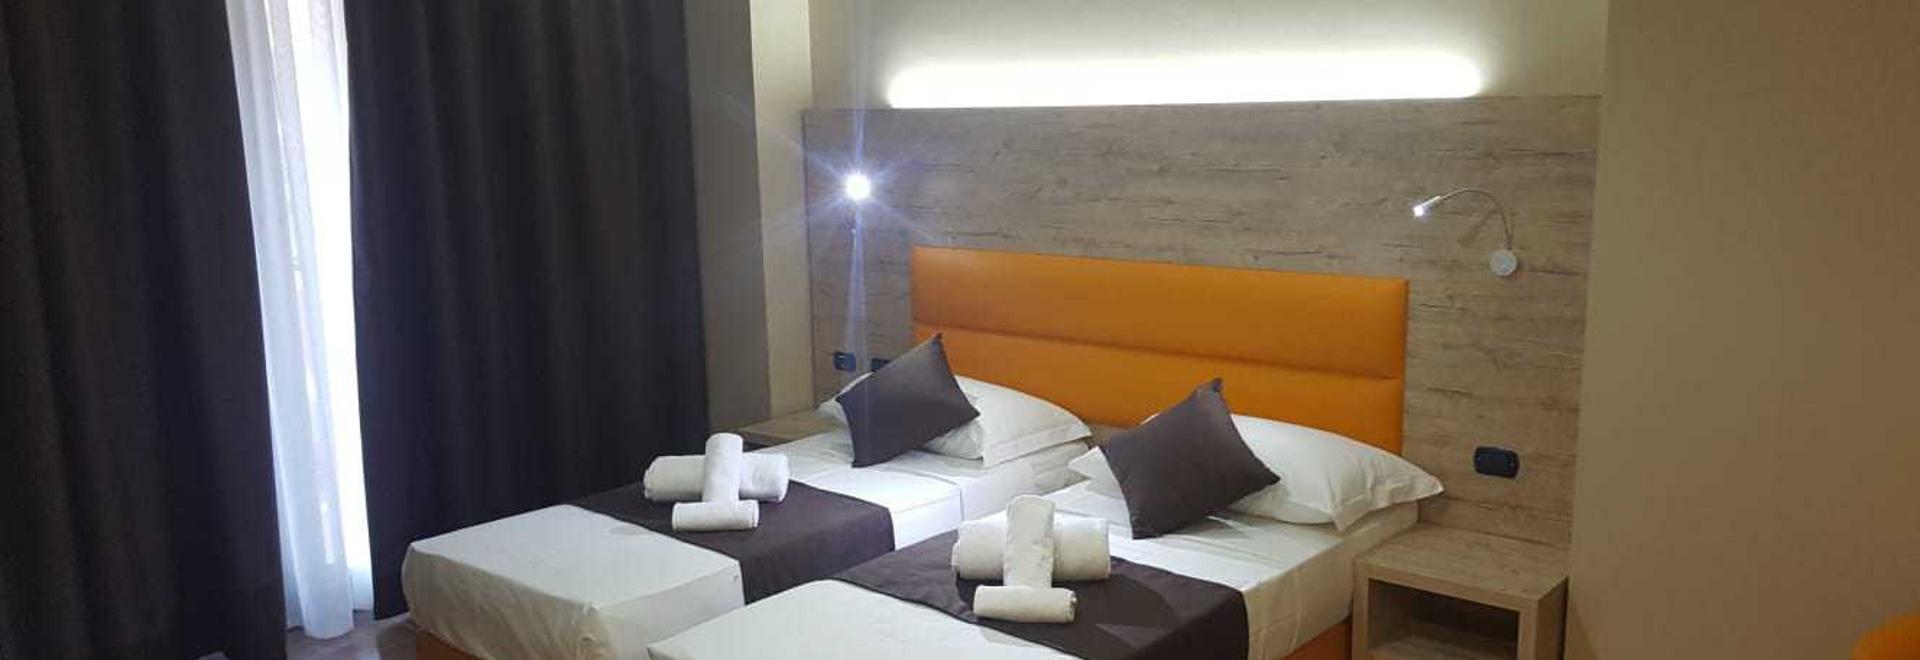 Mobilspazio has furnished Stardivari Hotel in Milan